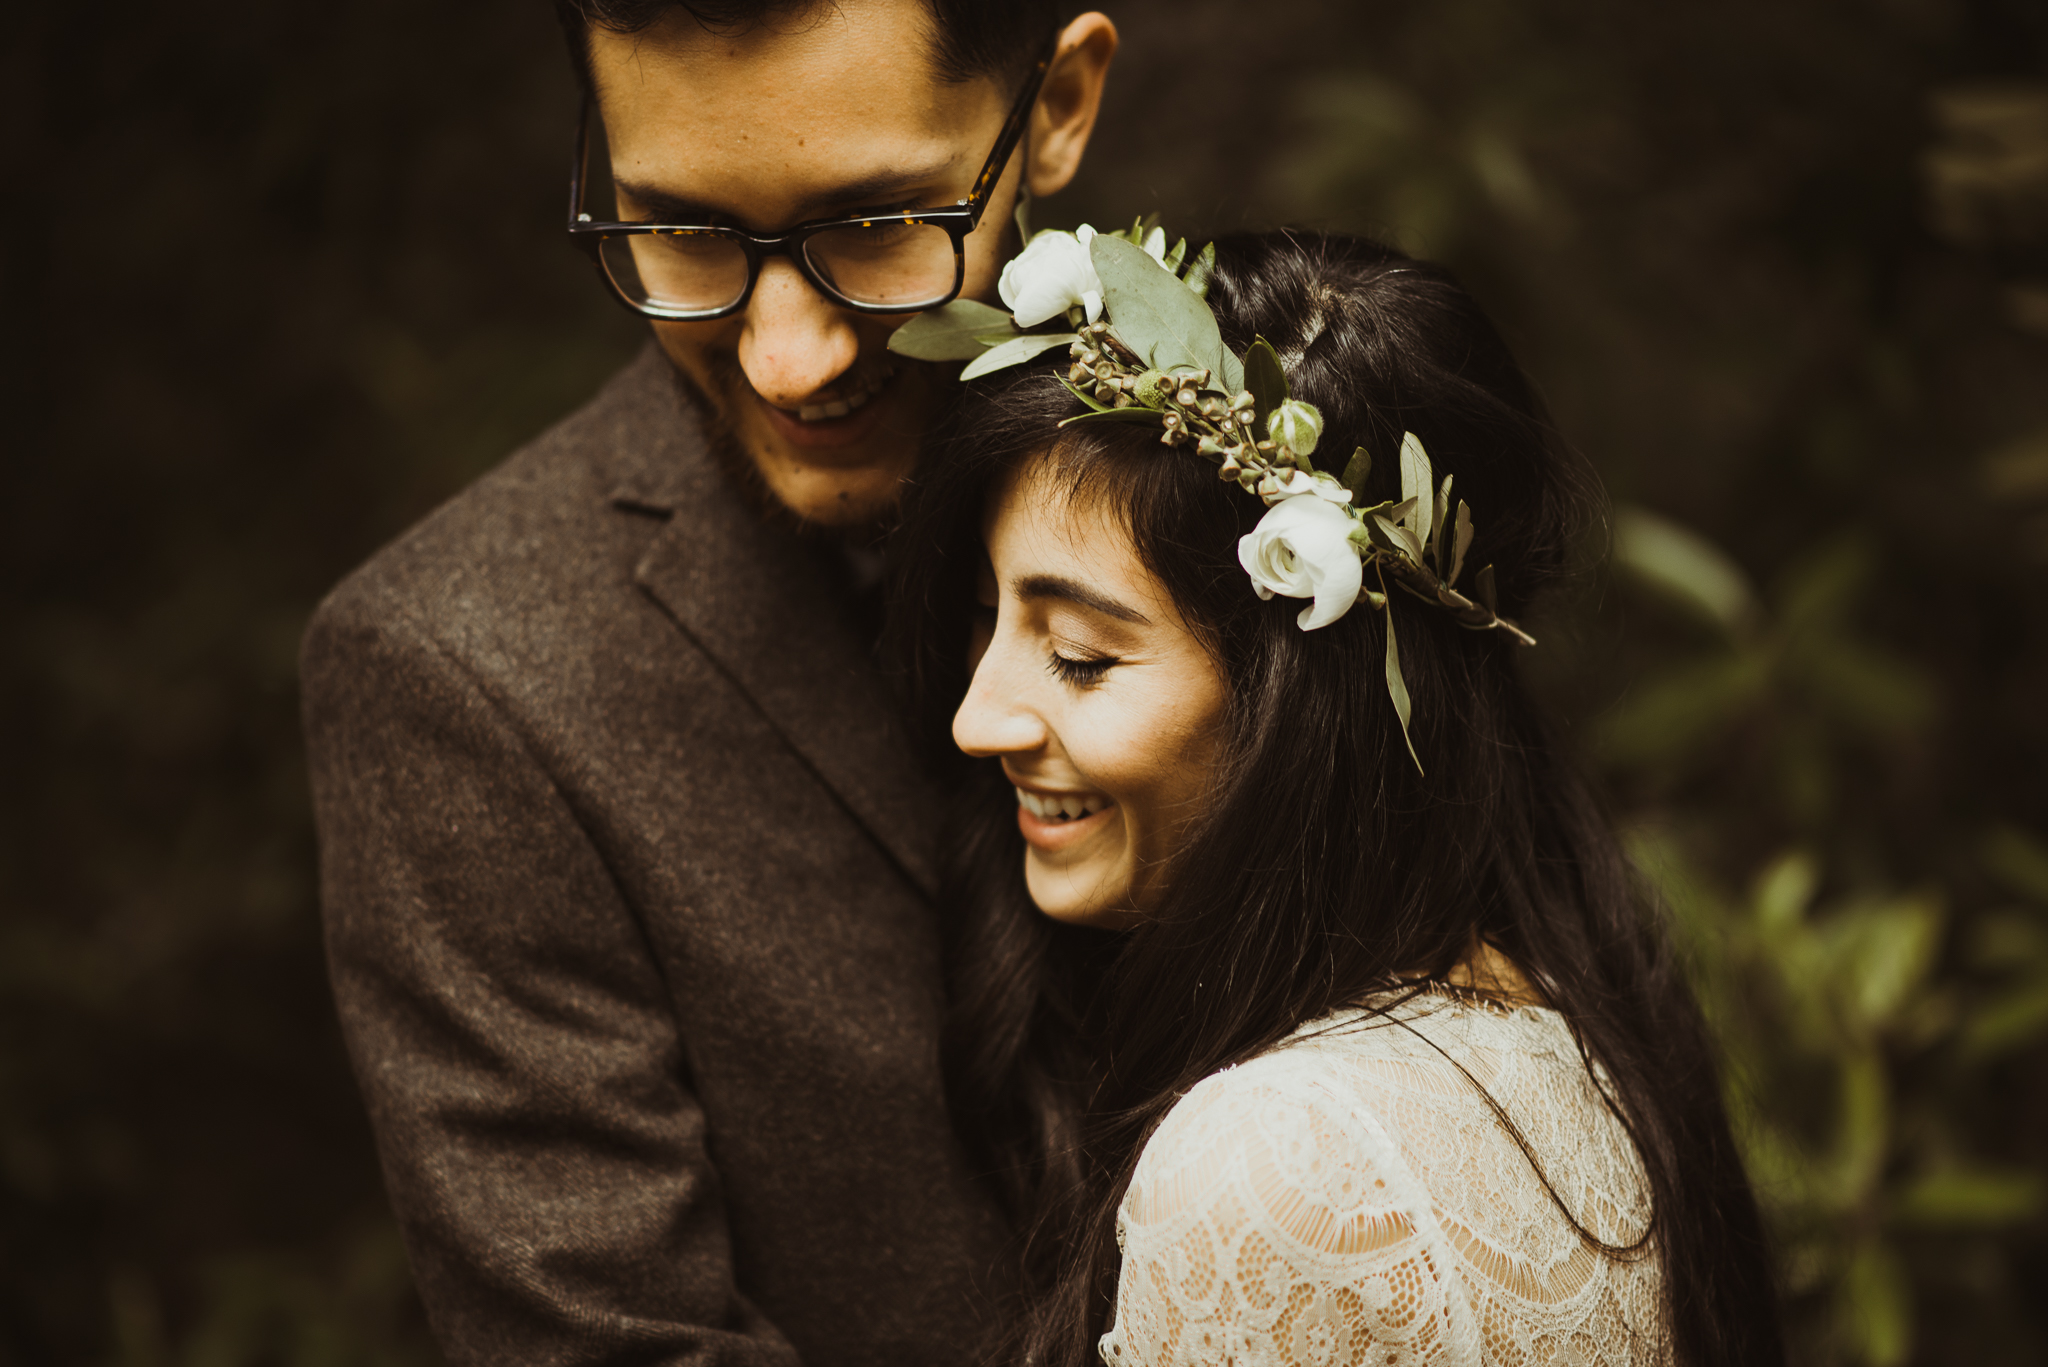 ©Isaiah-&-Taylor-Photography---Oak-Canyon-Nature-Center-Wedding,-Anaheim-Hills-031.jpg